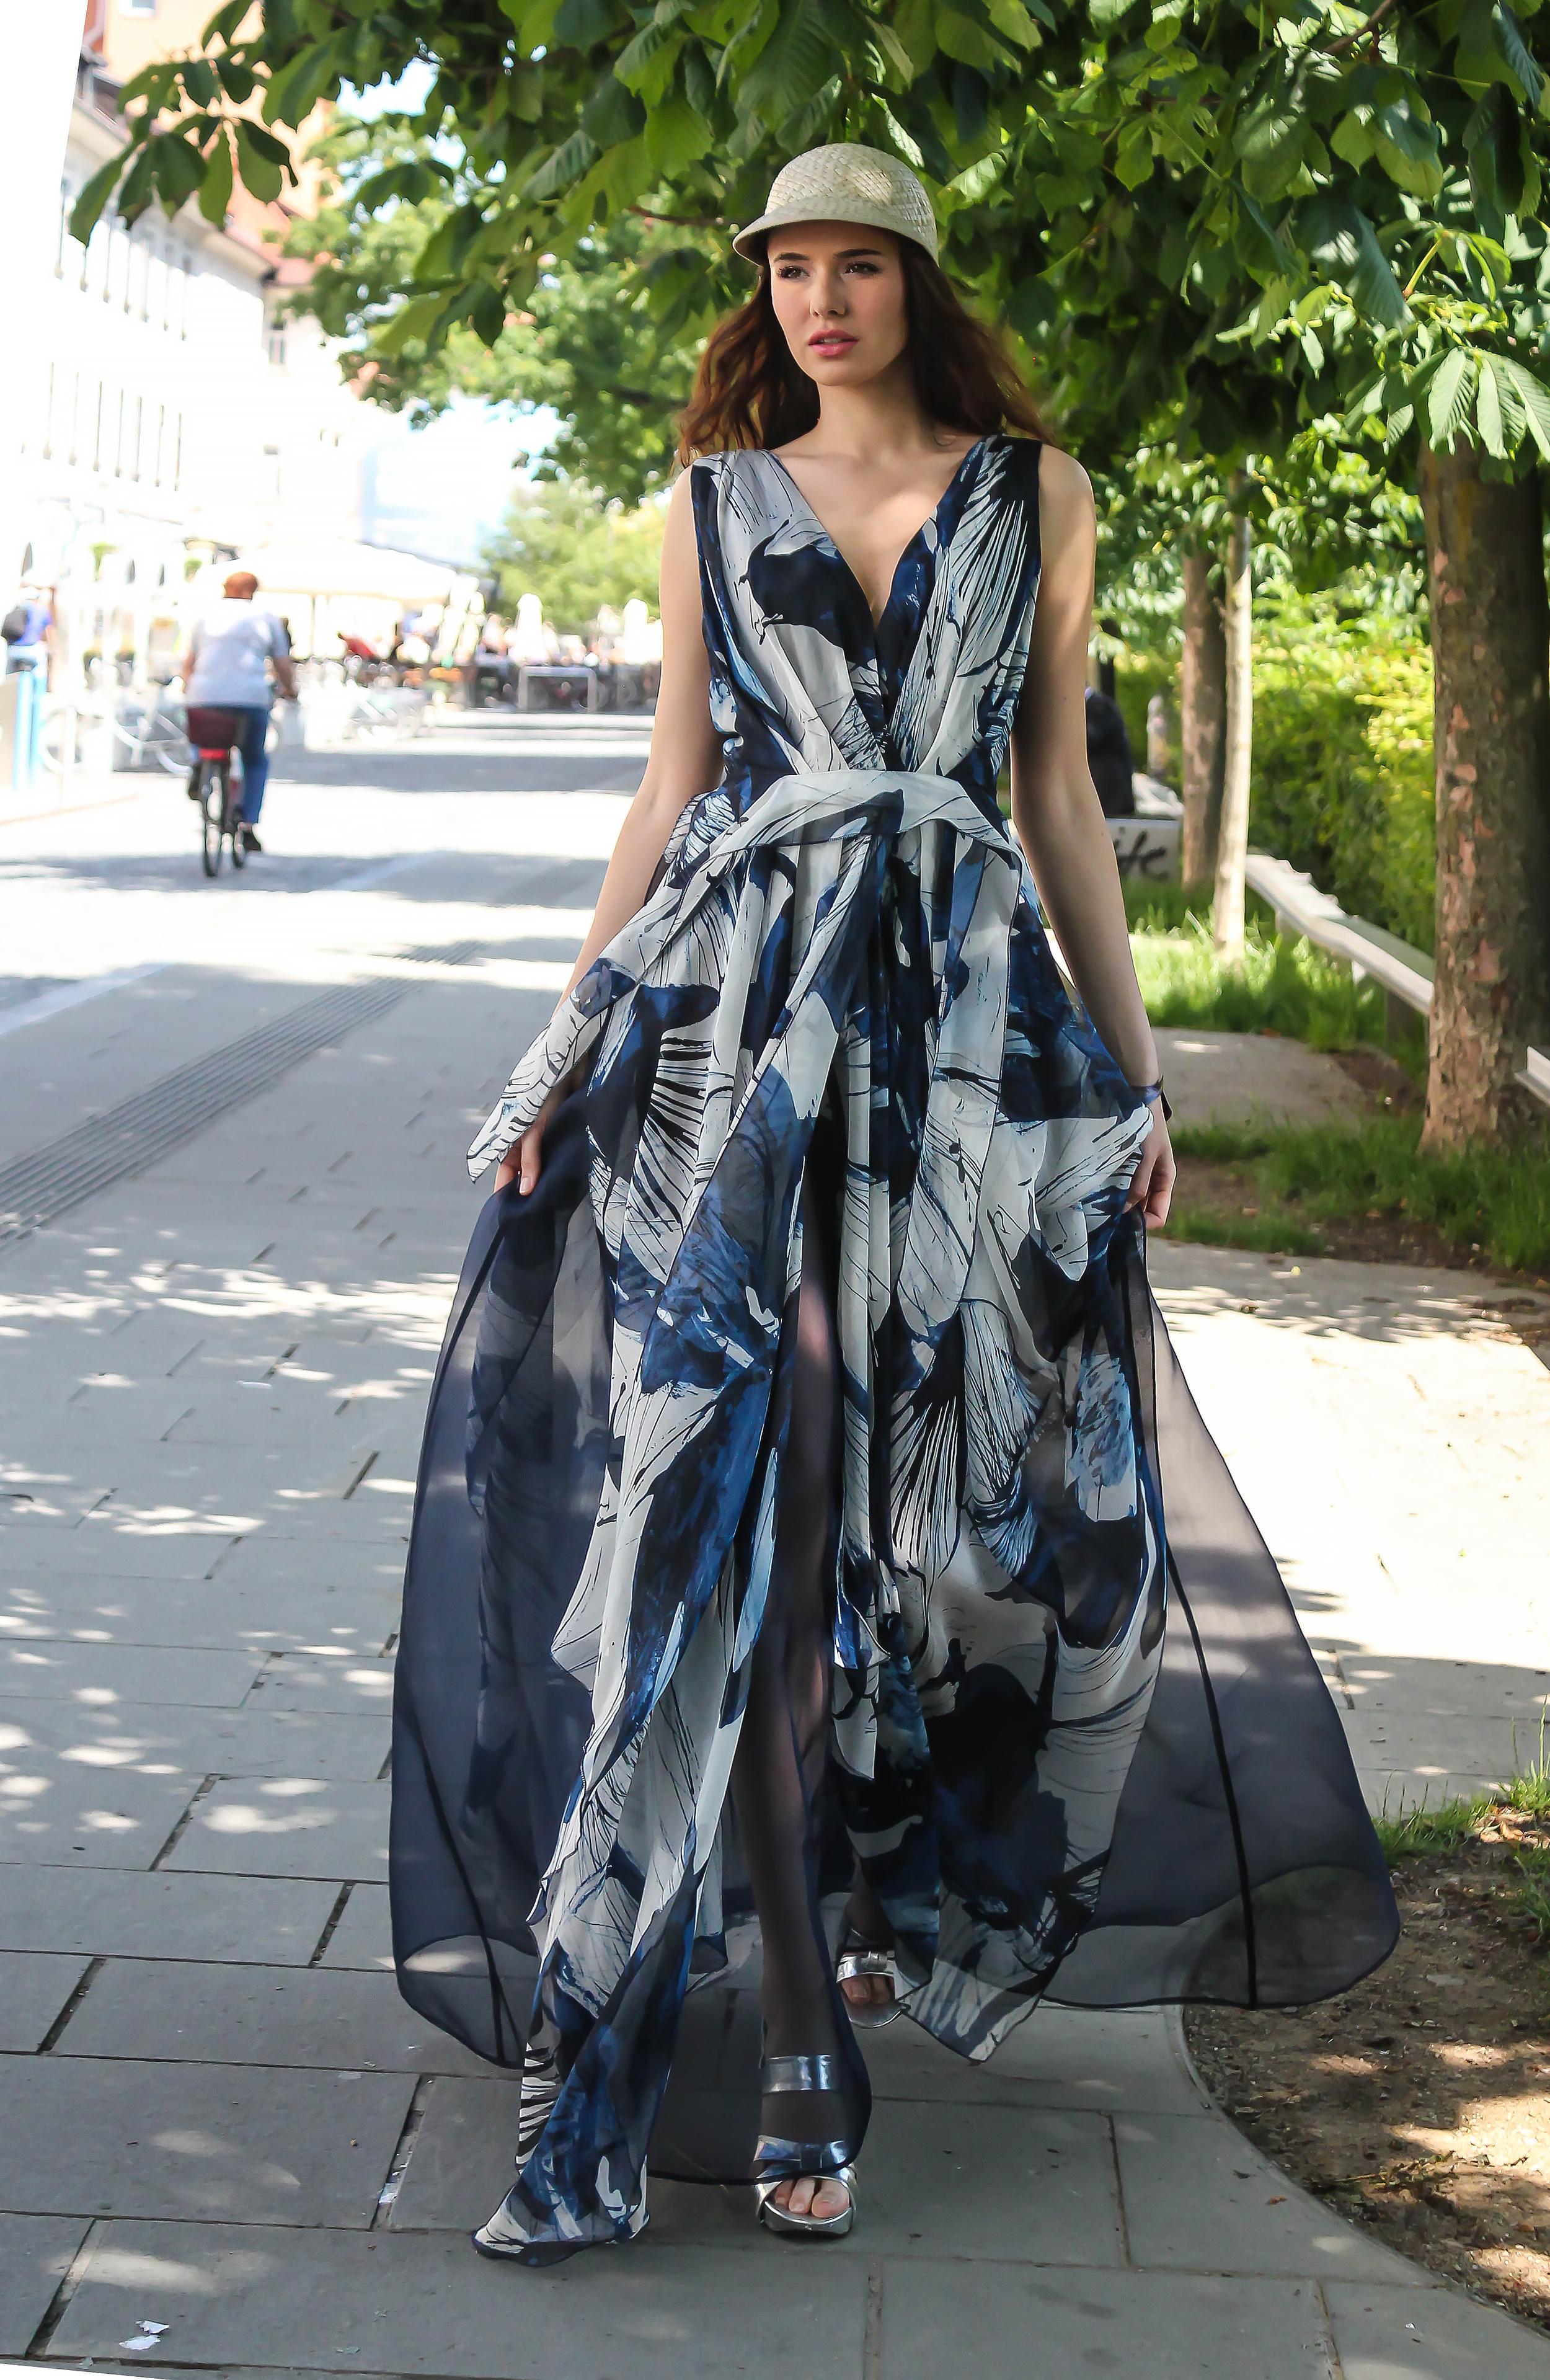 obleka: Princip  kapa: Firma by Sanja